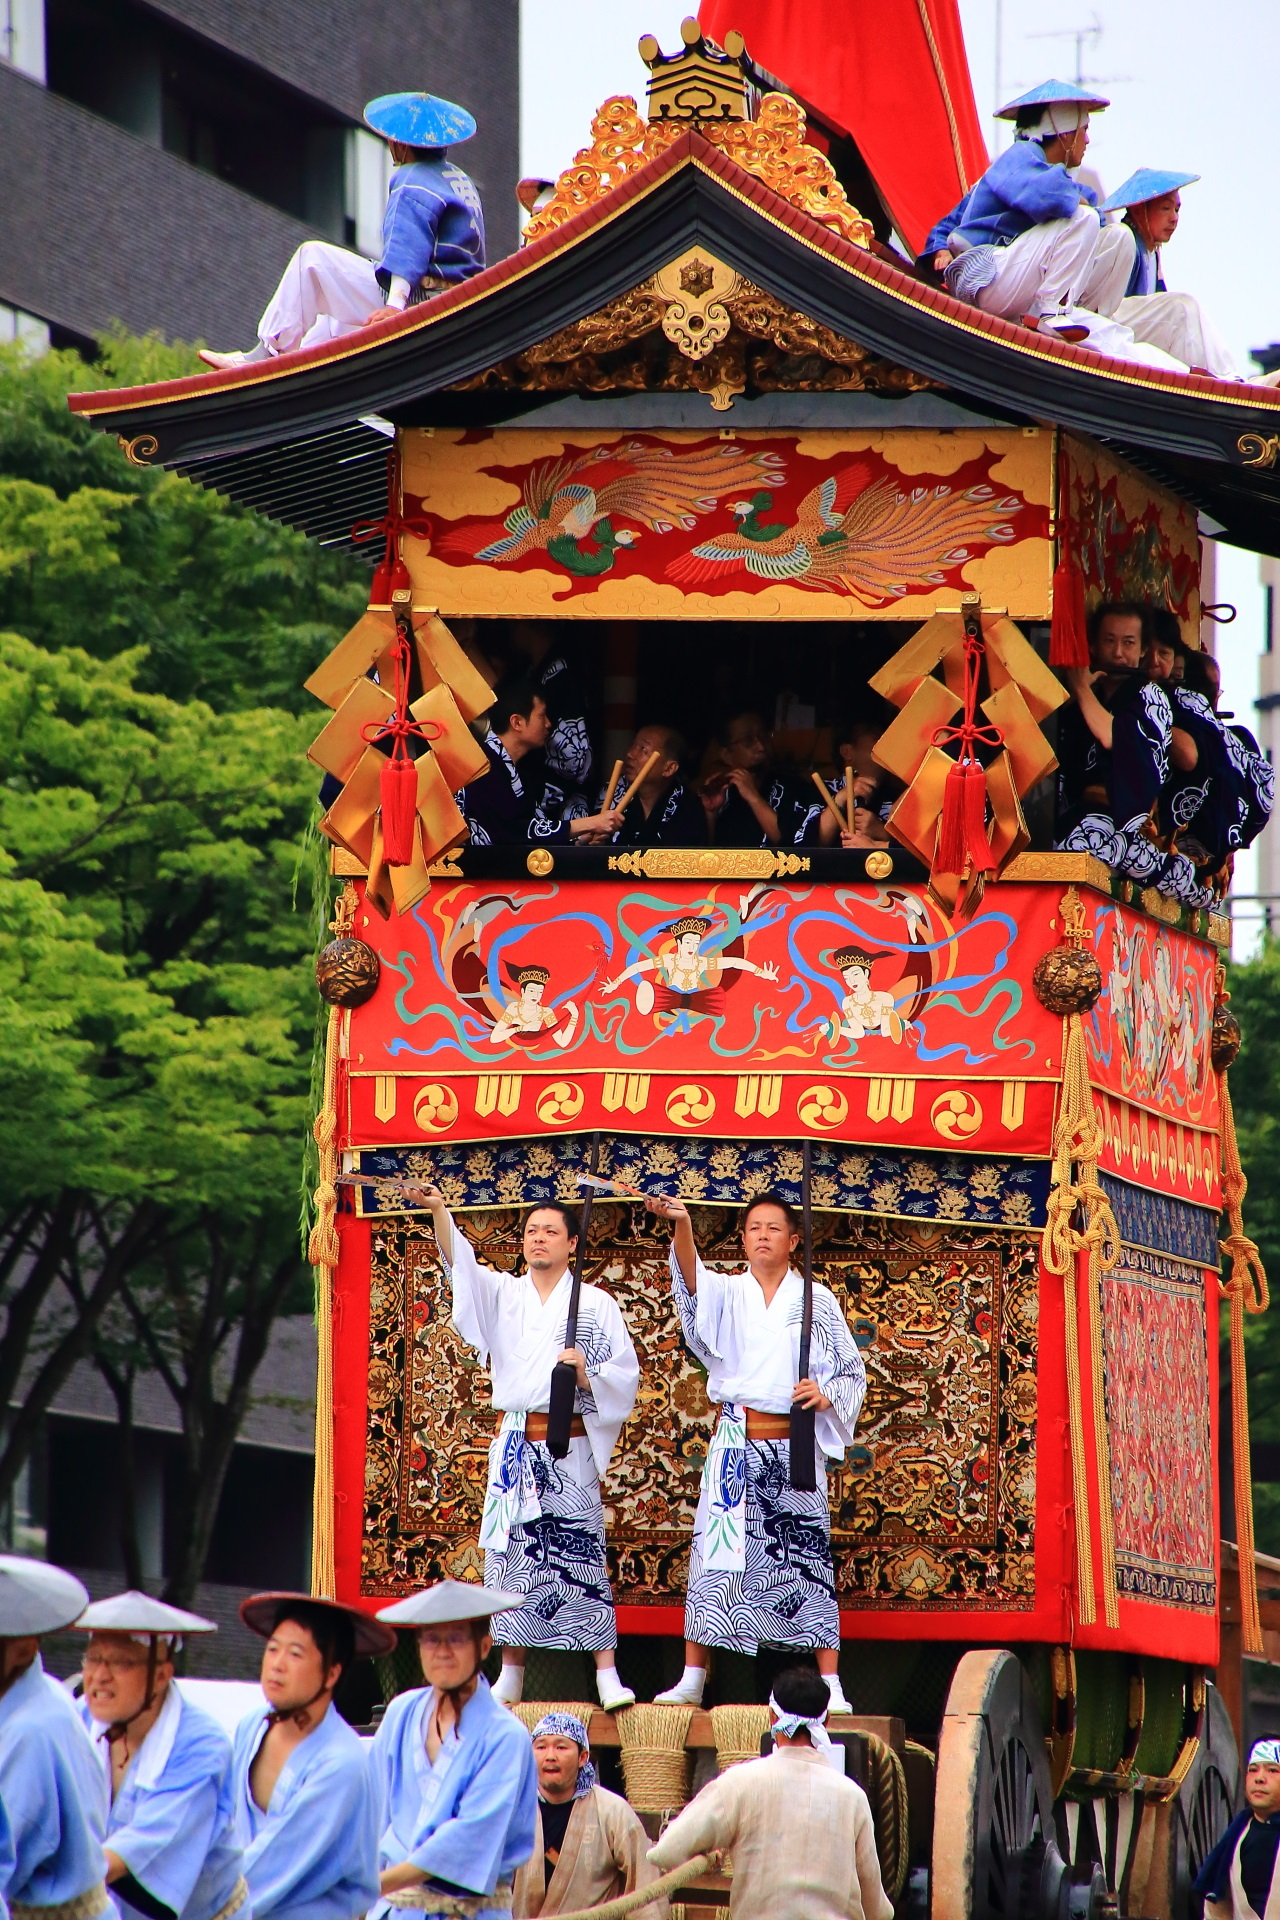 Minami-Kannon-Yama appeared in the Yama-Hoko Junko Cruise of the Kyoto Gion-Matsuri Festival